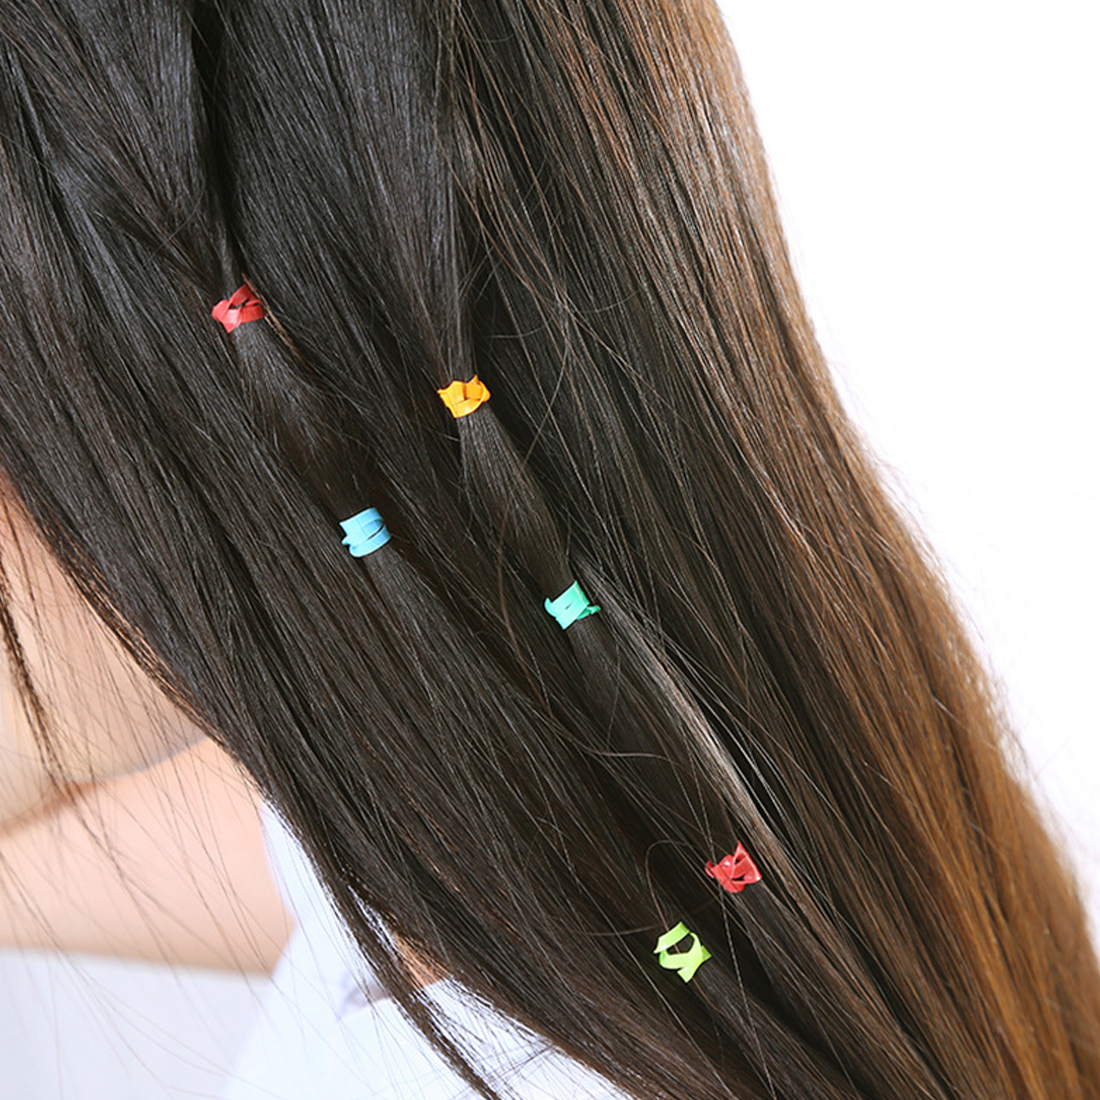 300Pcs Elastic Hair Bands Rope Ponytail Rubber Tpu Hair Holders Ties Braids Plaits Hairwear Hair Accessory for Women Girls